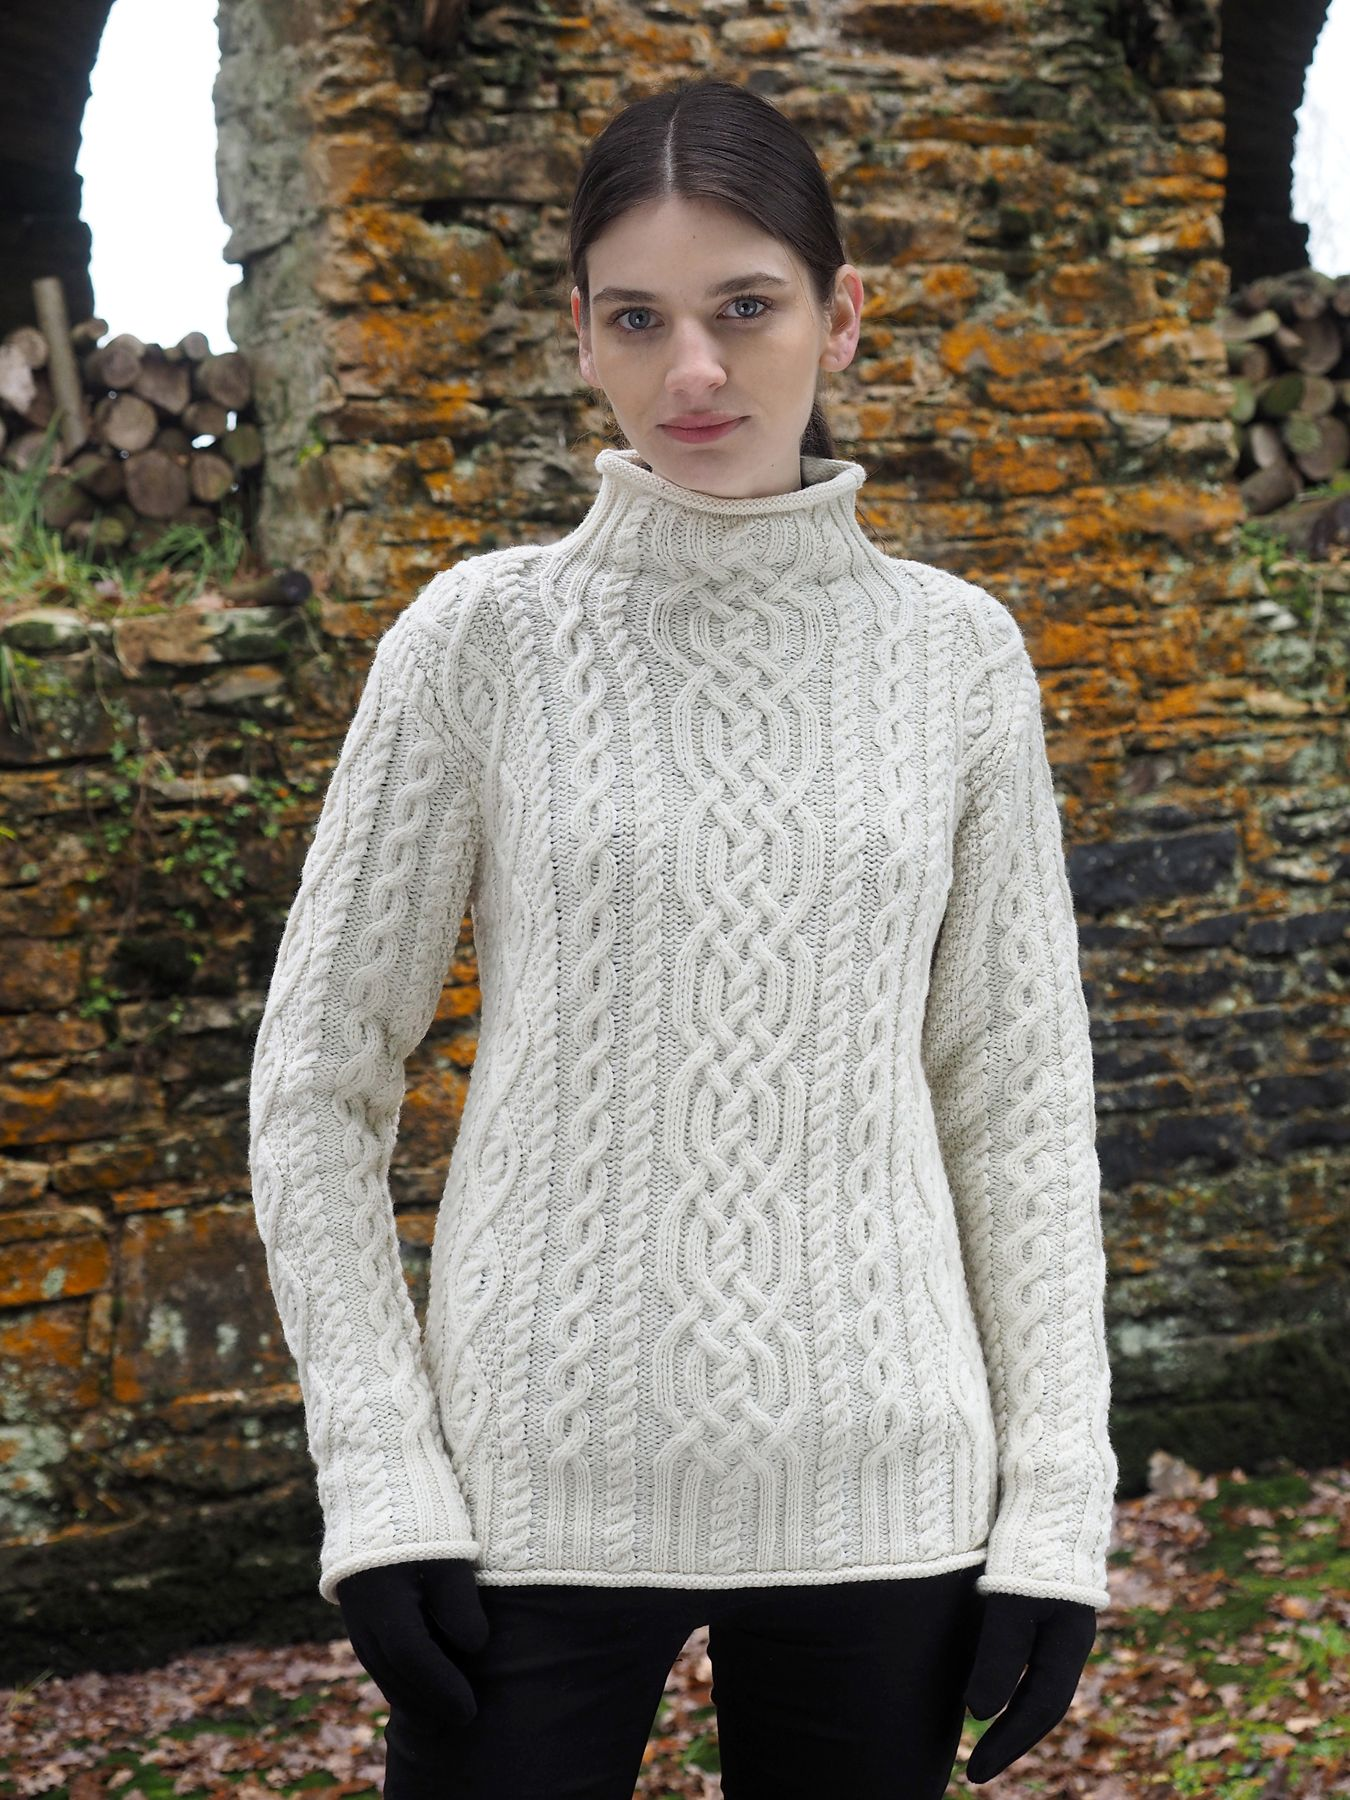 Celtic Ladies Aran Sweater by Natallia Kulikouskaya for ...